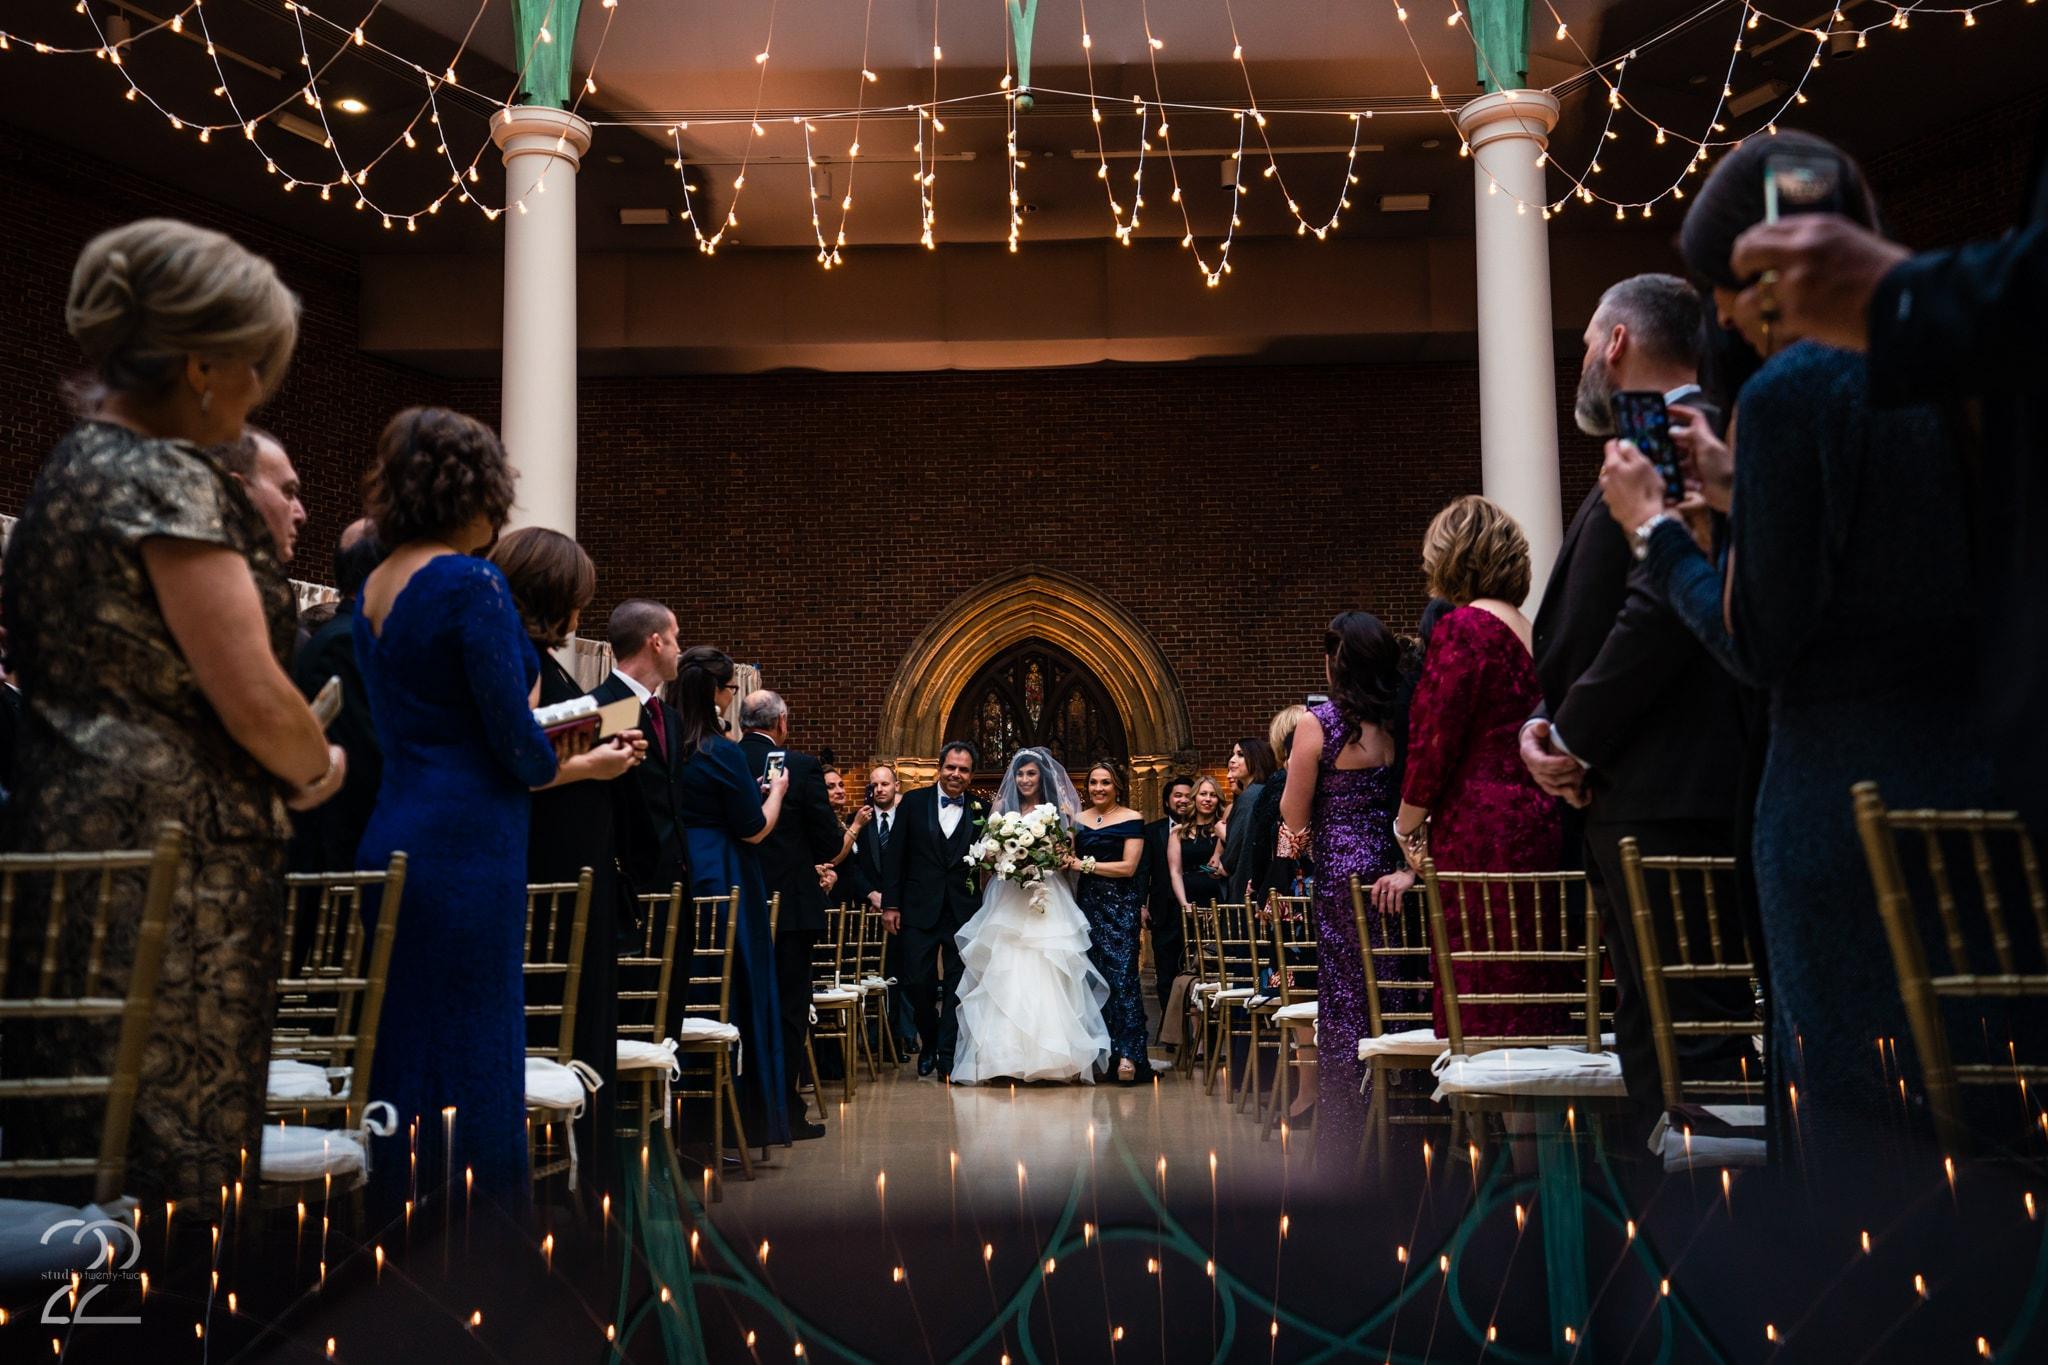 Weddings at Dayton Art Institute